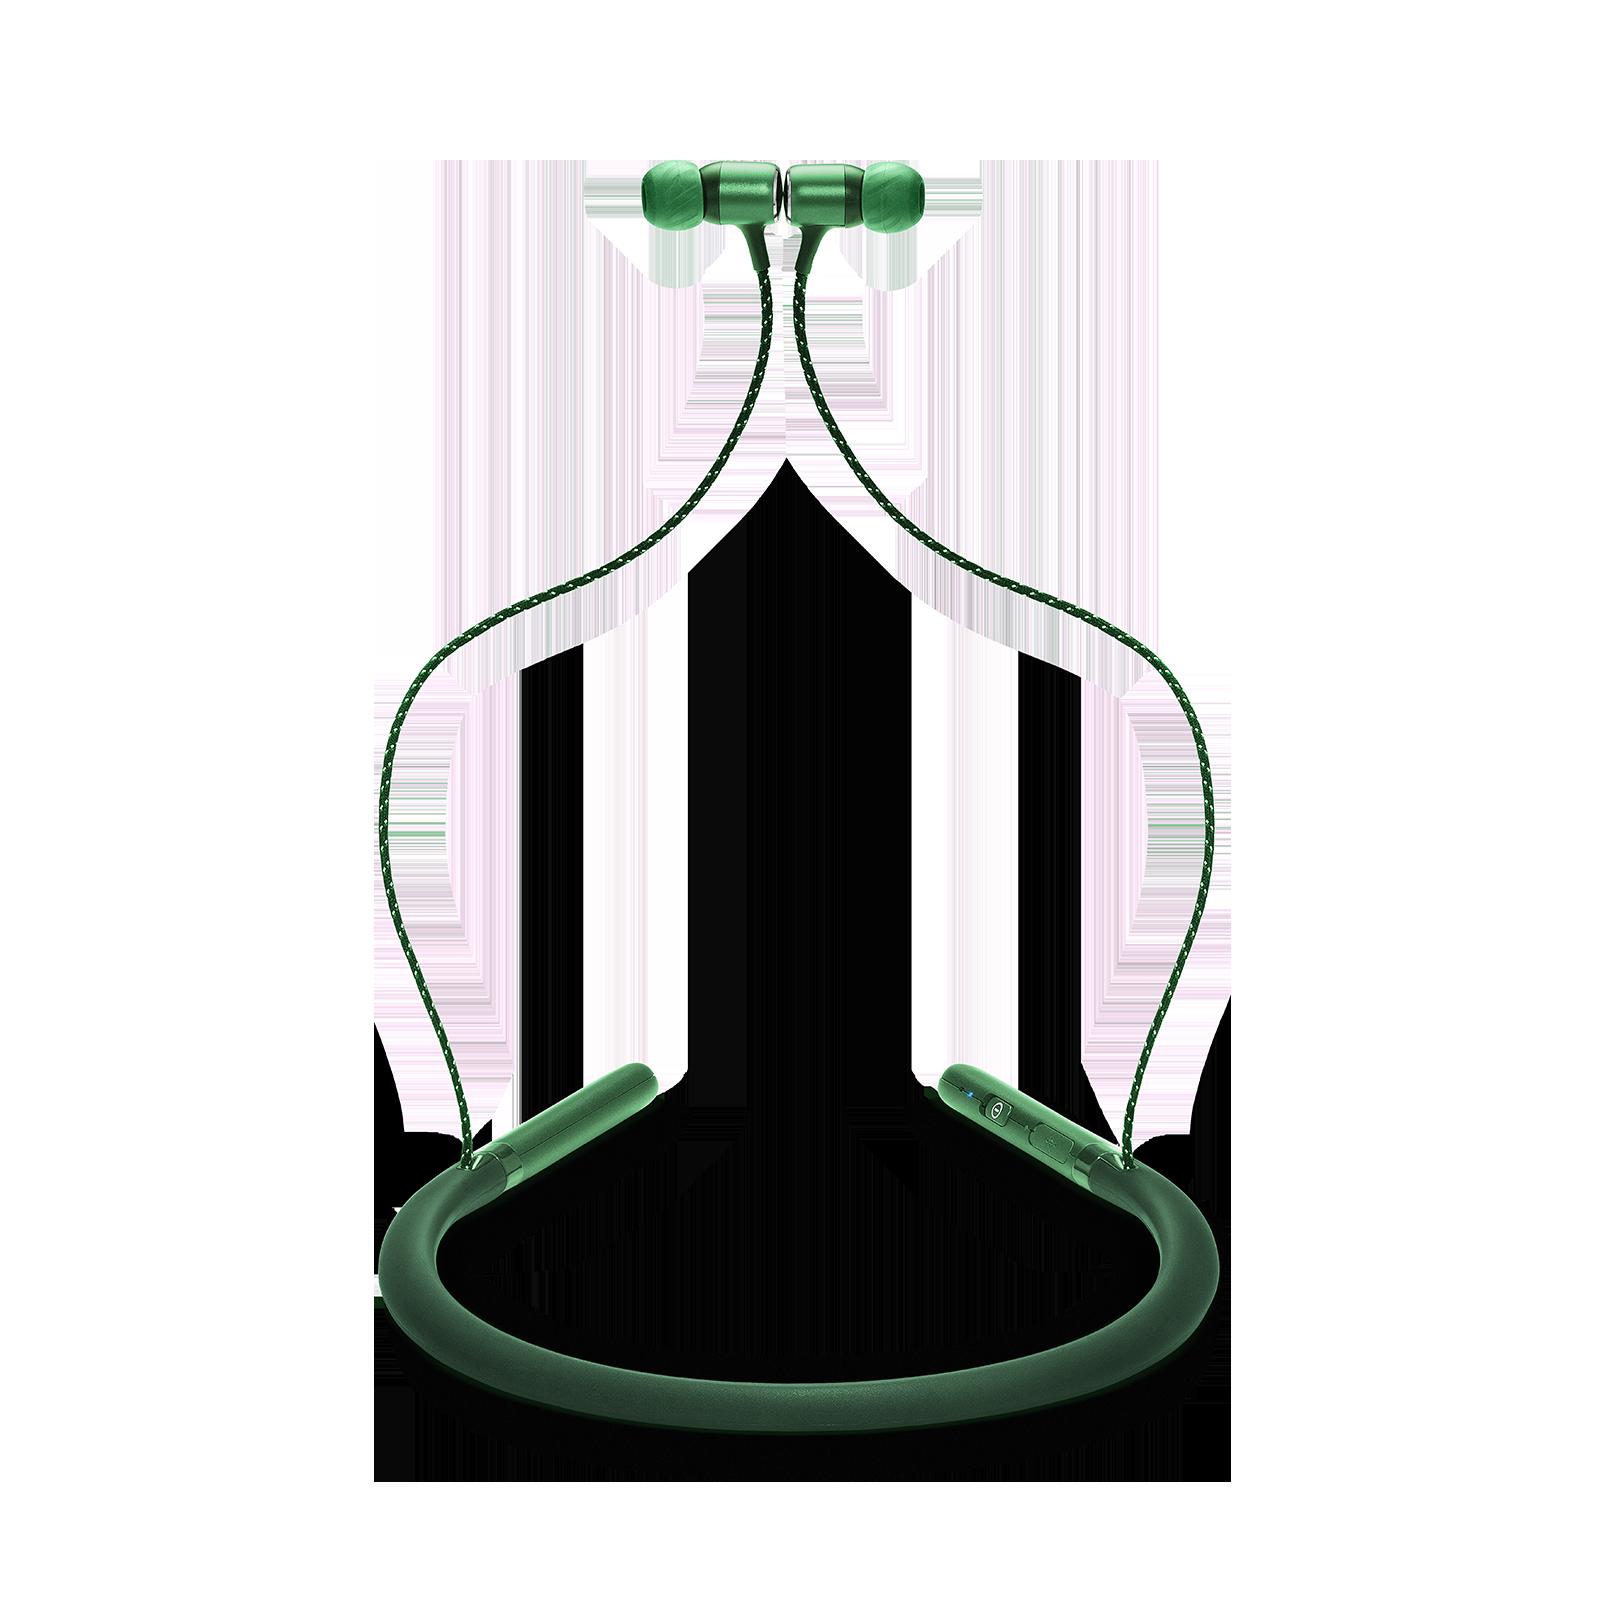 JBL LIVE 200BT - Green - Wireless in-ear neckband headphones - Detailshot 1